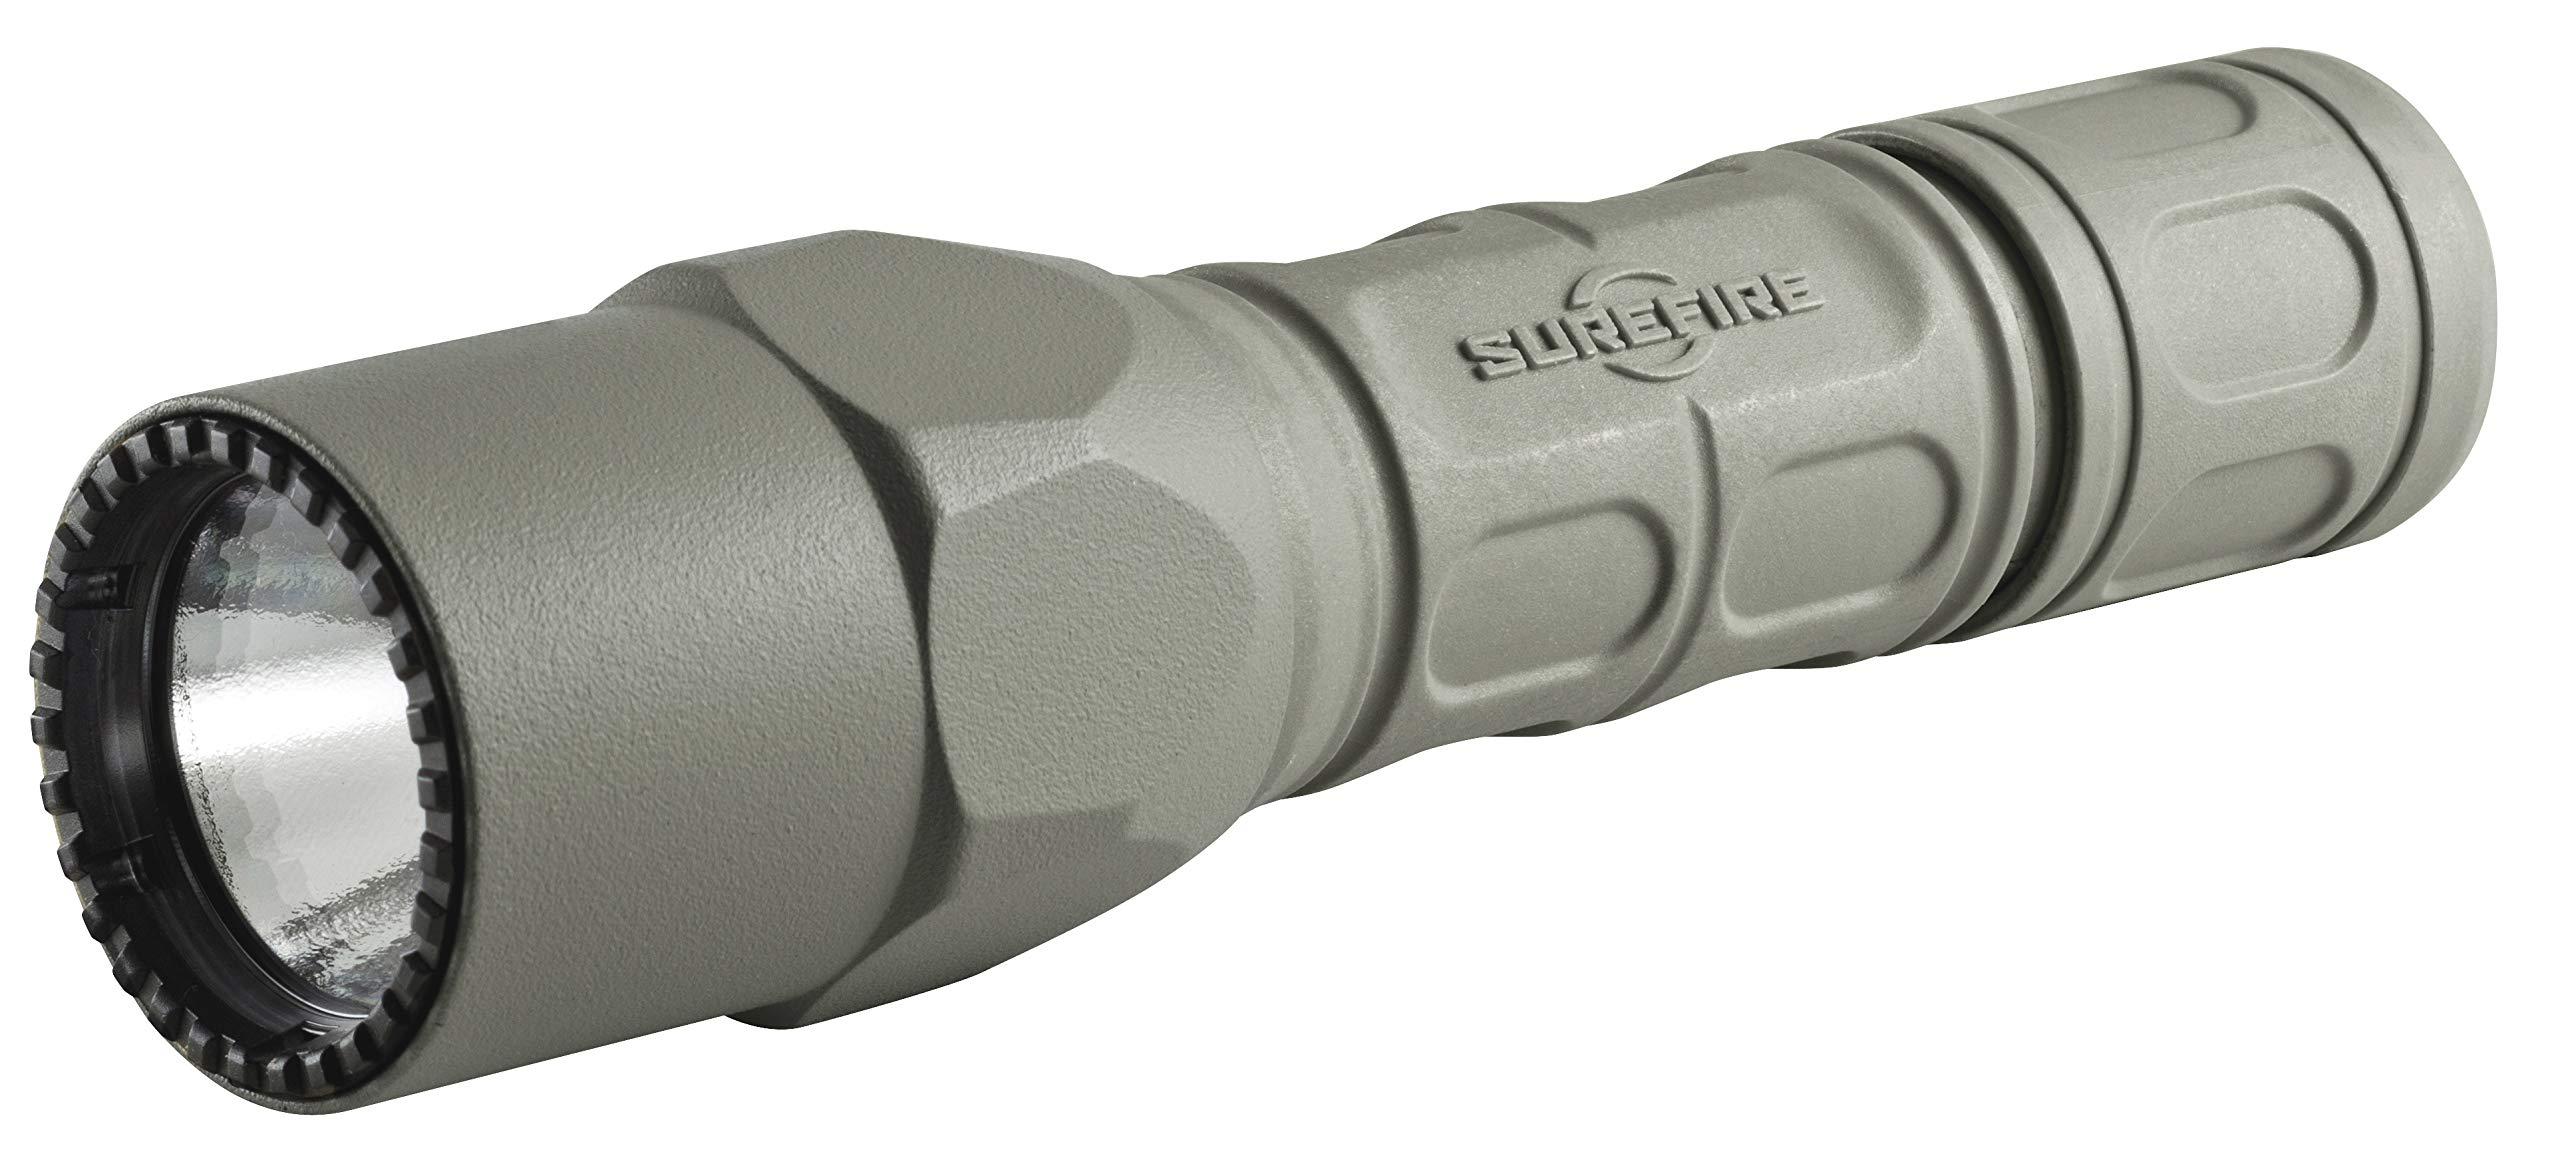 SureFire G2X Pro G2X Pro Dual-Output LED Flashlight with Click Switch, Foliage Green, Foliage Green